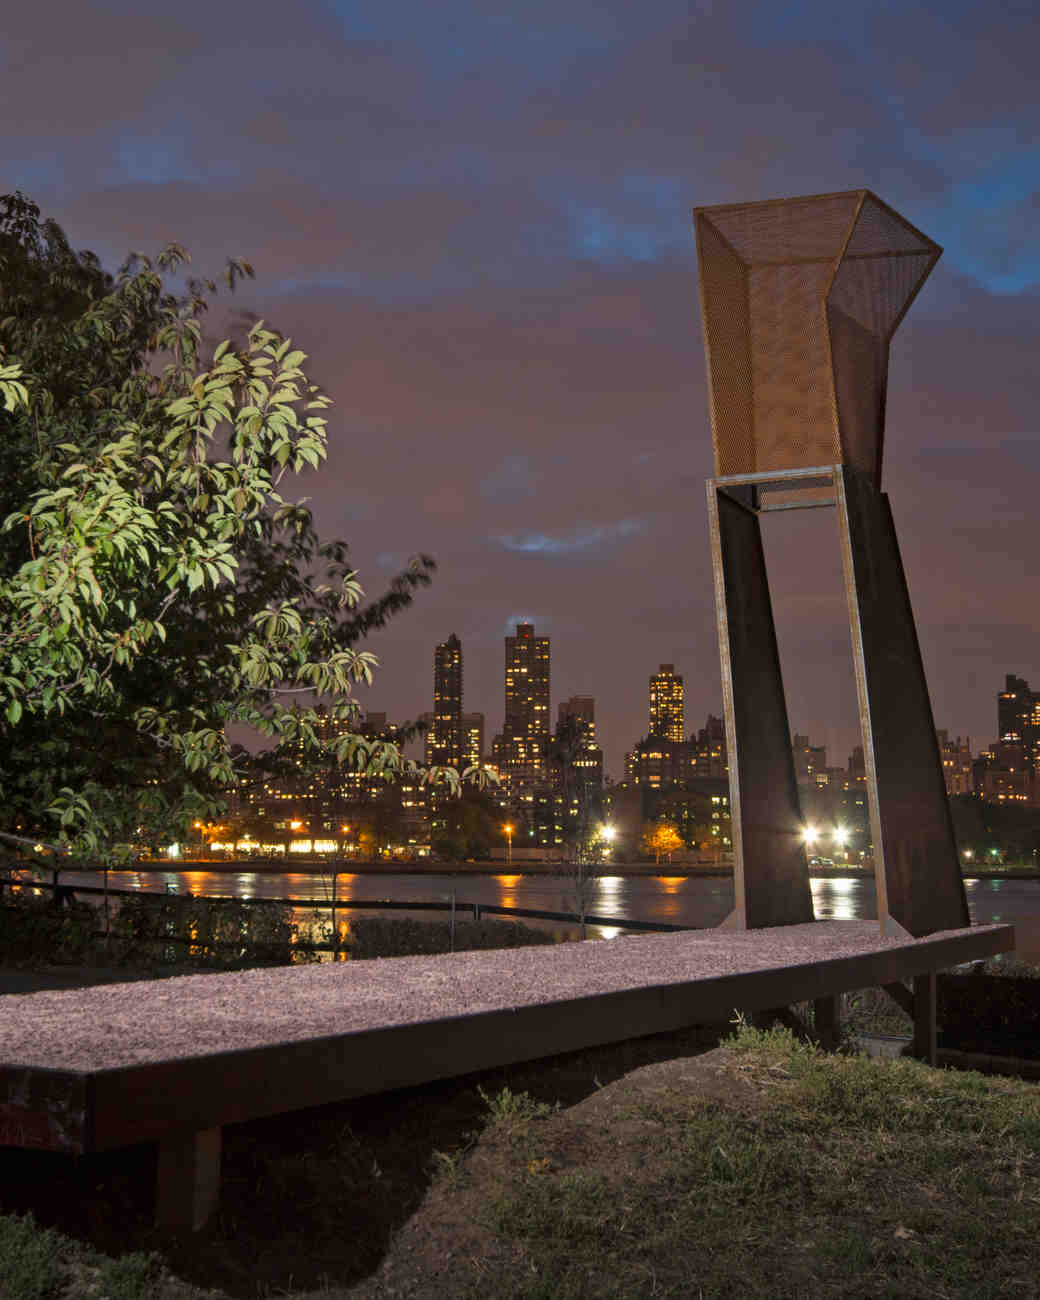 nyc-proposal-spot-socrates-sculpture-park-queens-1114.jpg